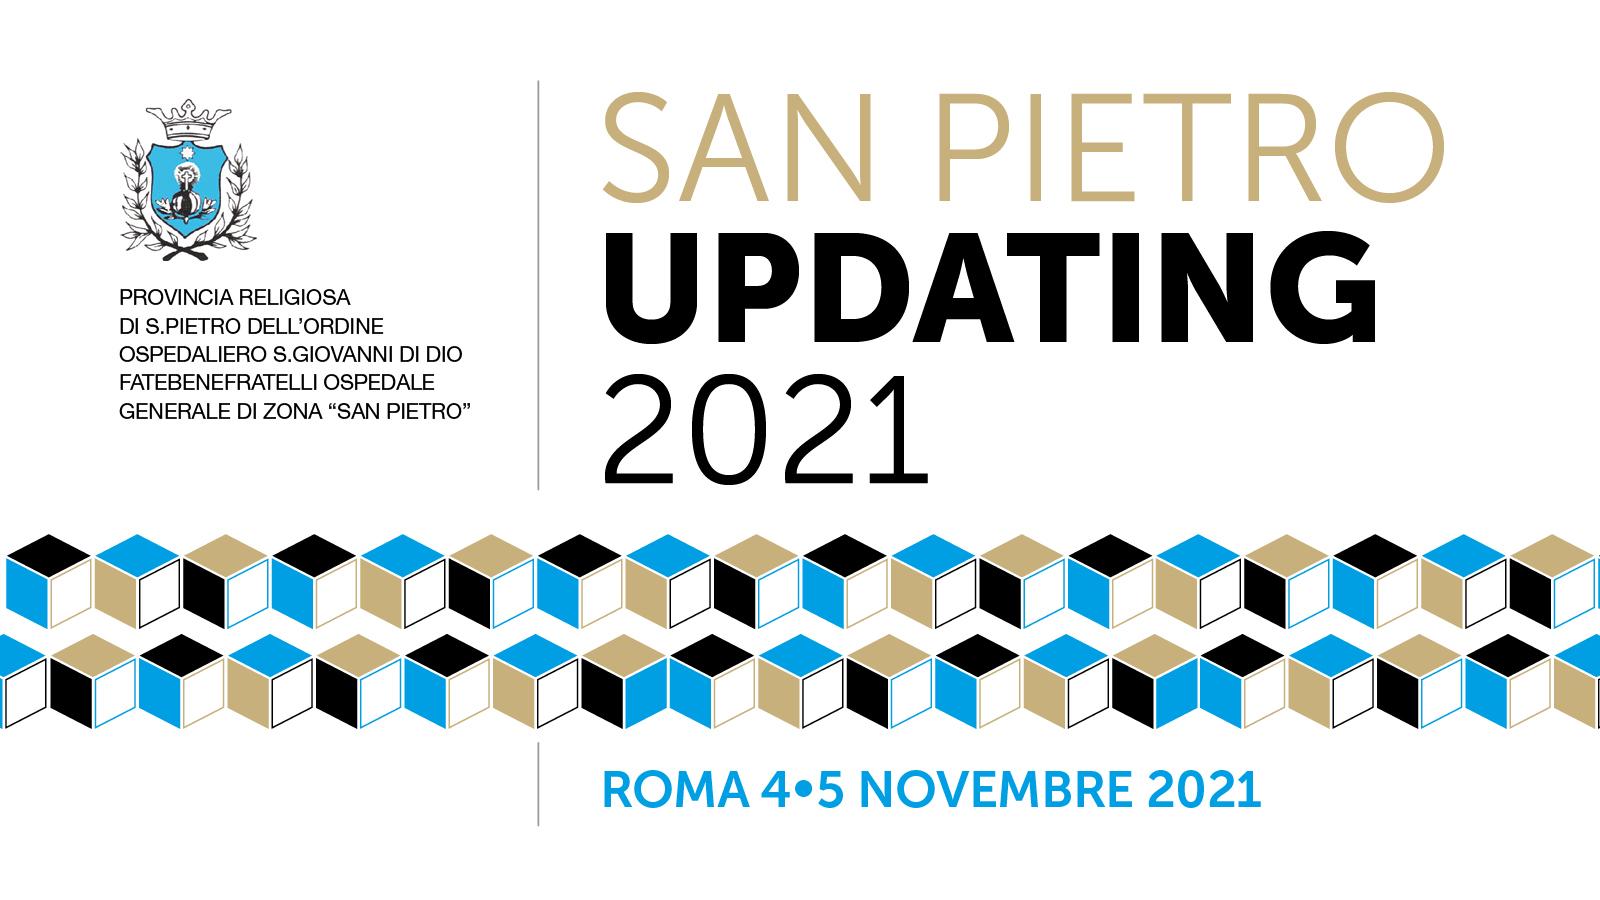 San Pietro Updating 2021